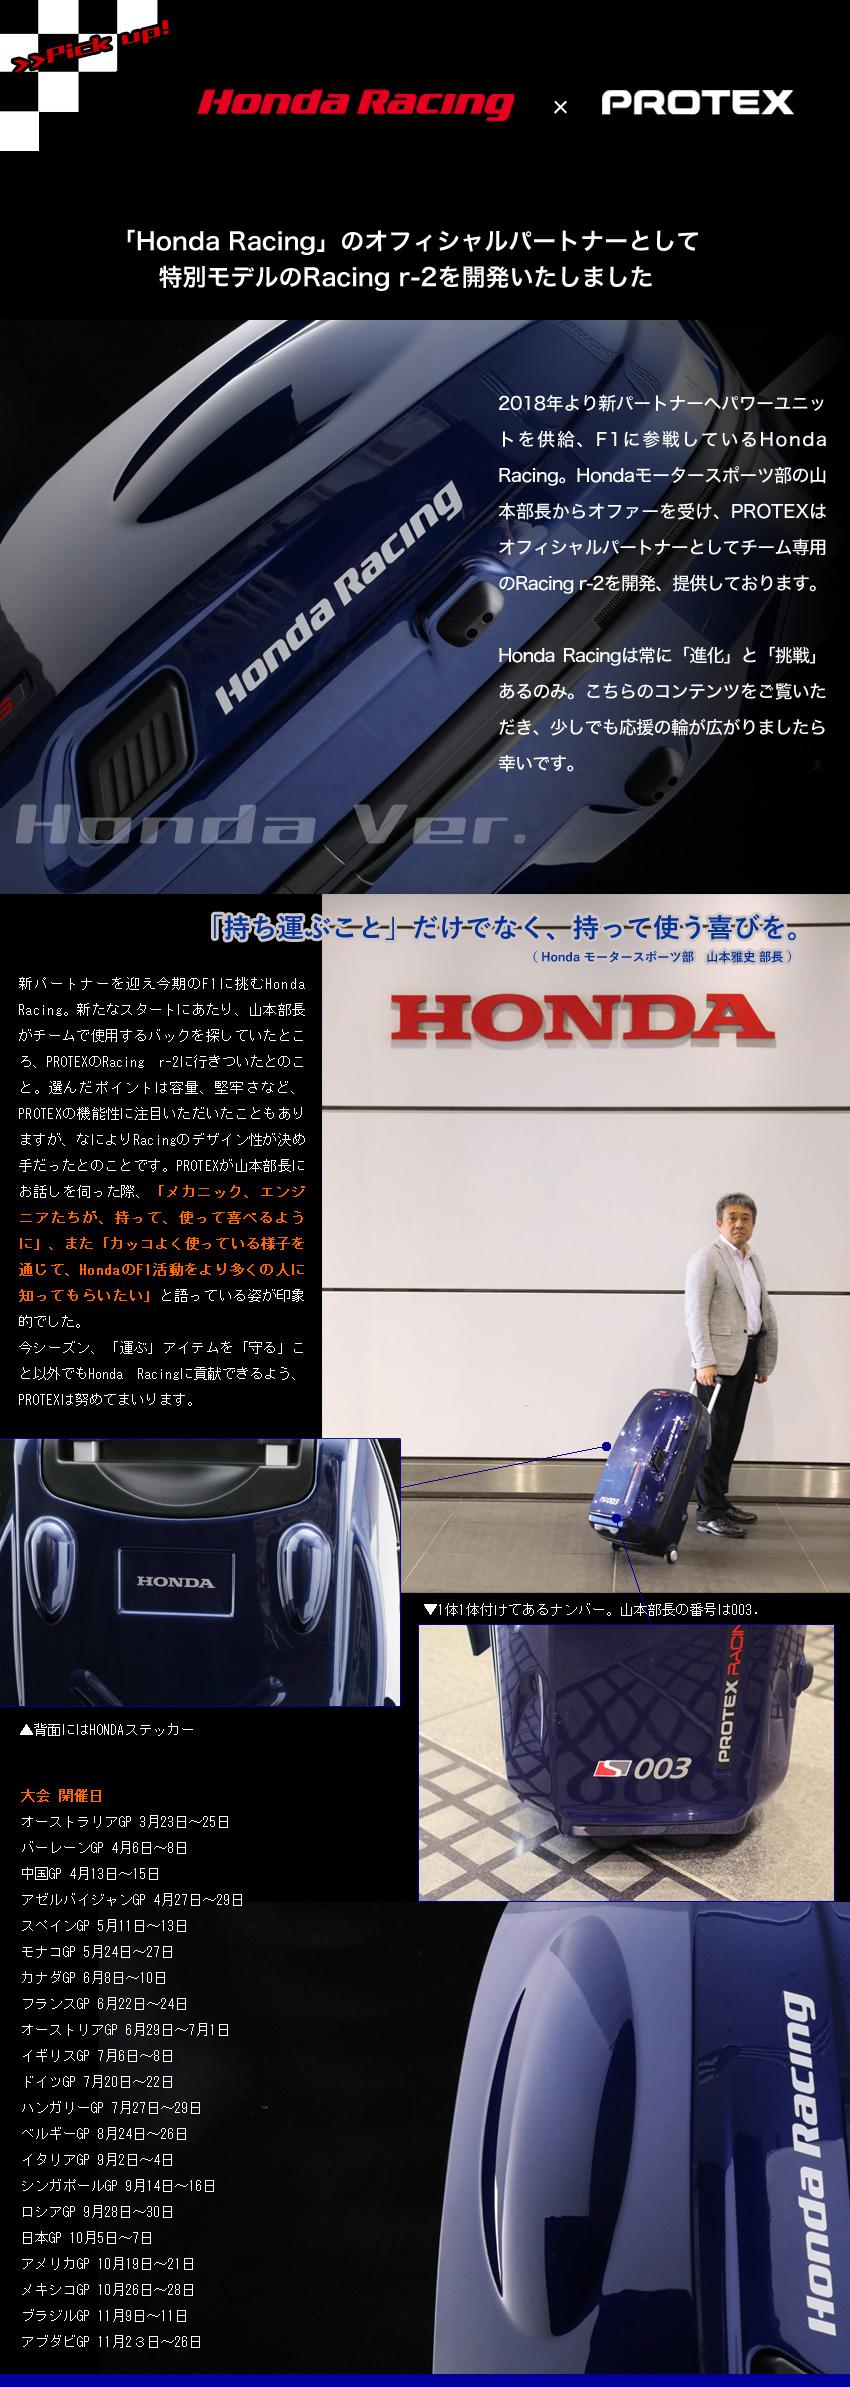 Hondaレーシングオフィシャルパートナーとして